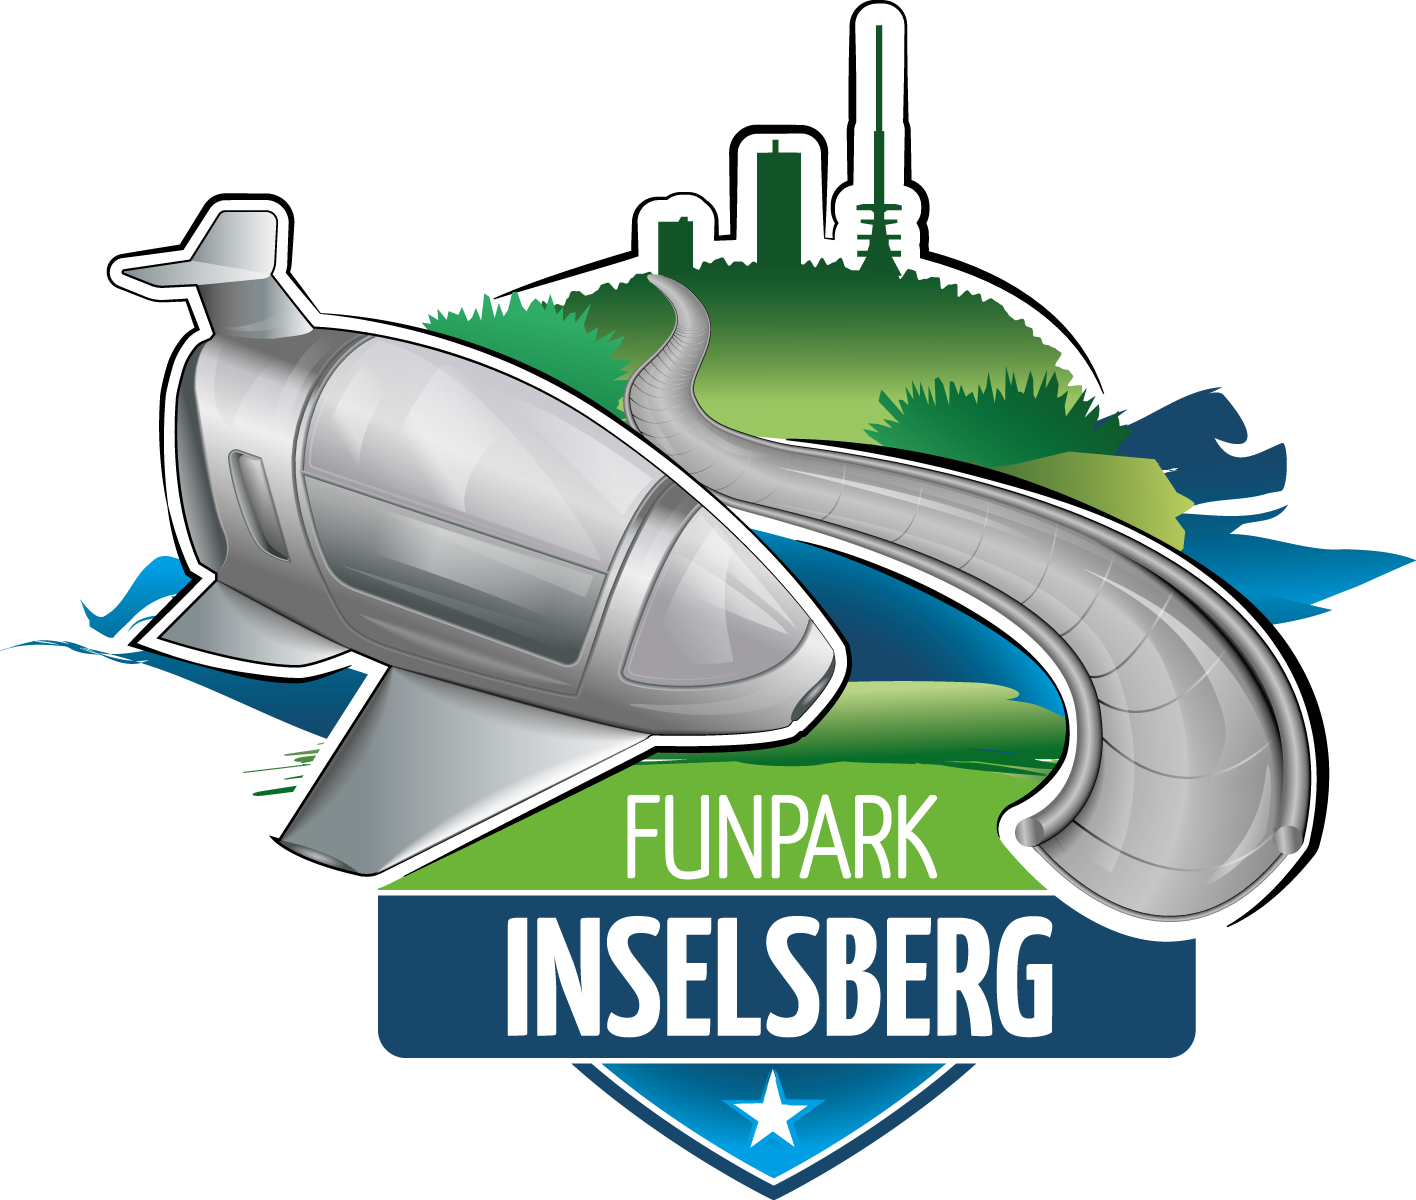 Logo Funpark Inselsberg